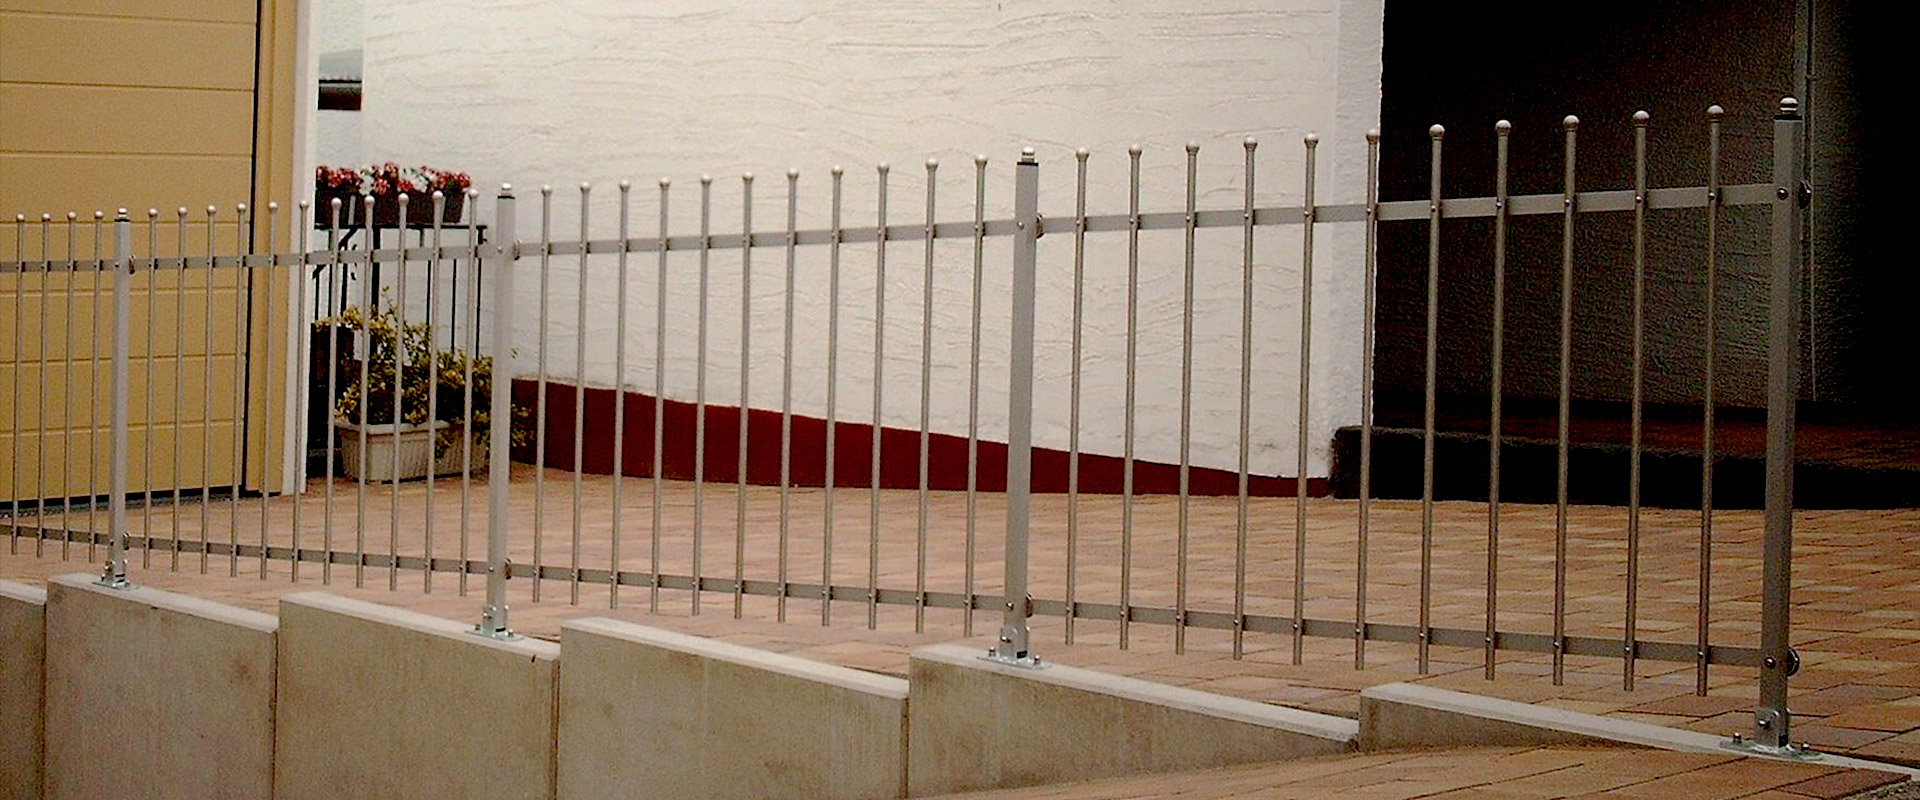 Zaun Brillant Edelstahl - Fertige Zaunmodelle - Seiler Zaundesign